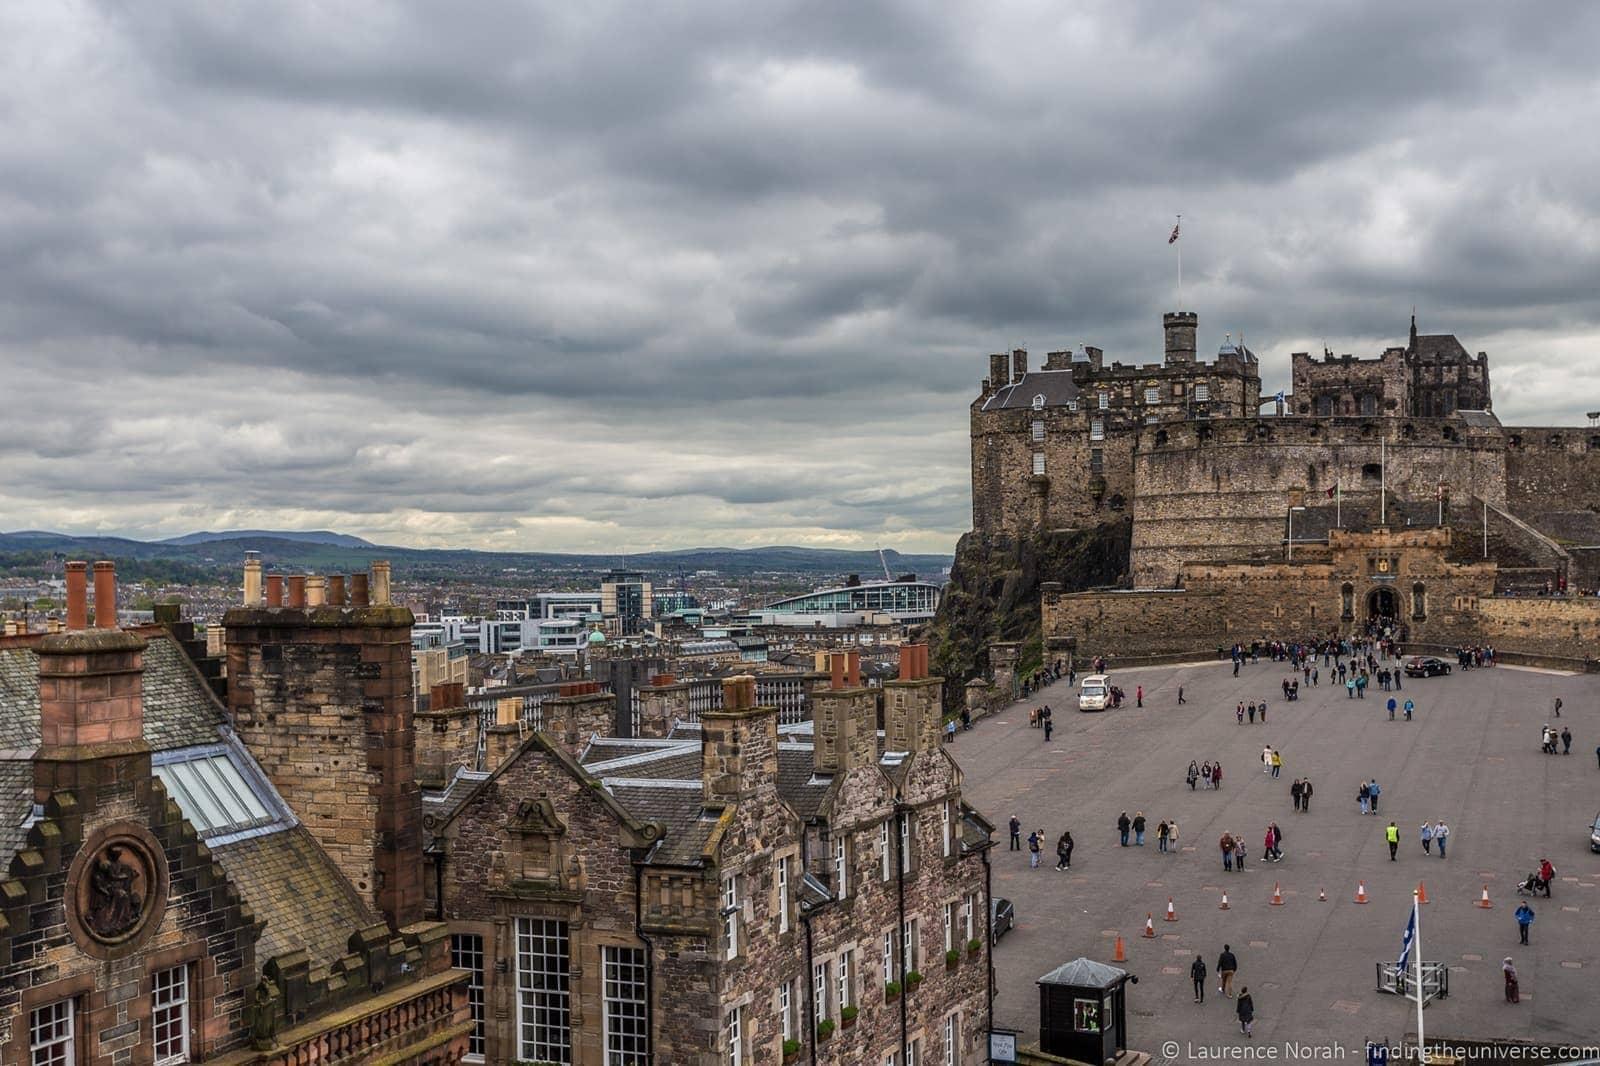 View from Camera Obscura Edinburgh